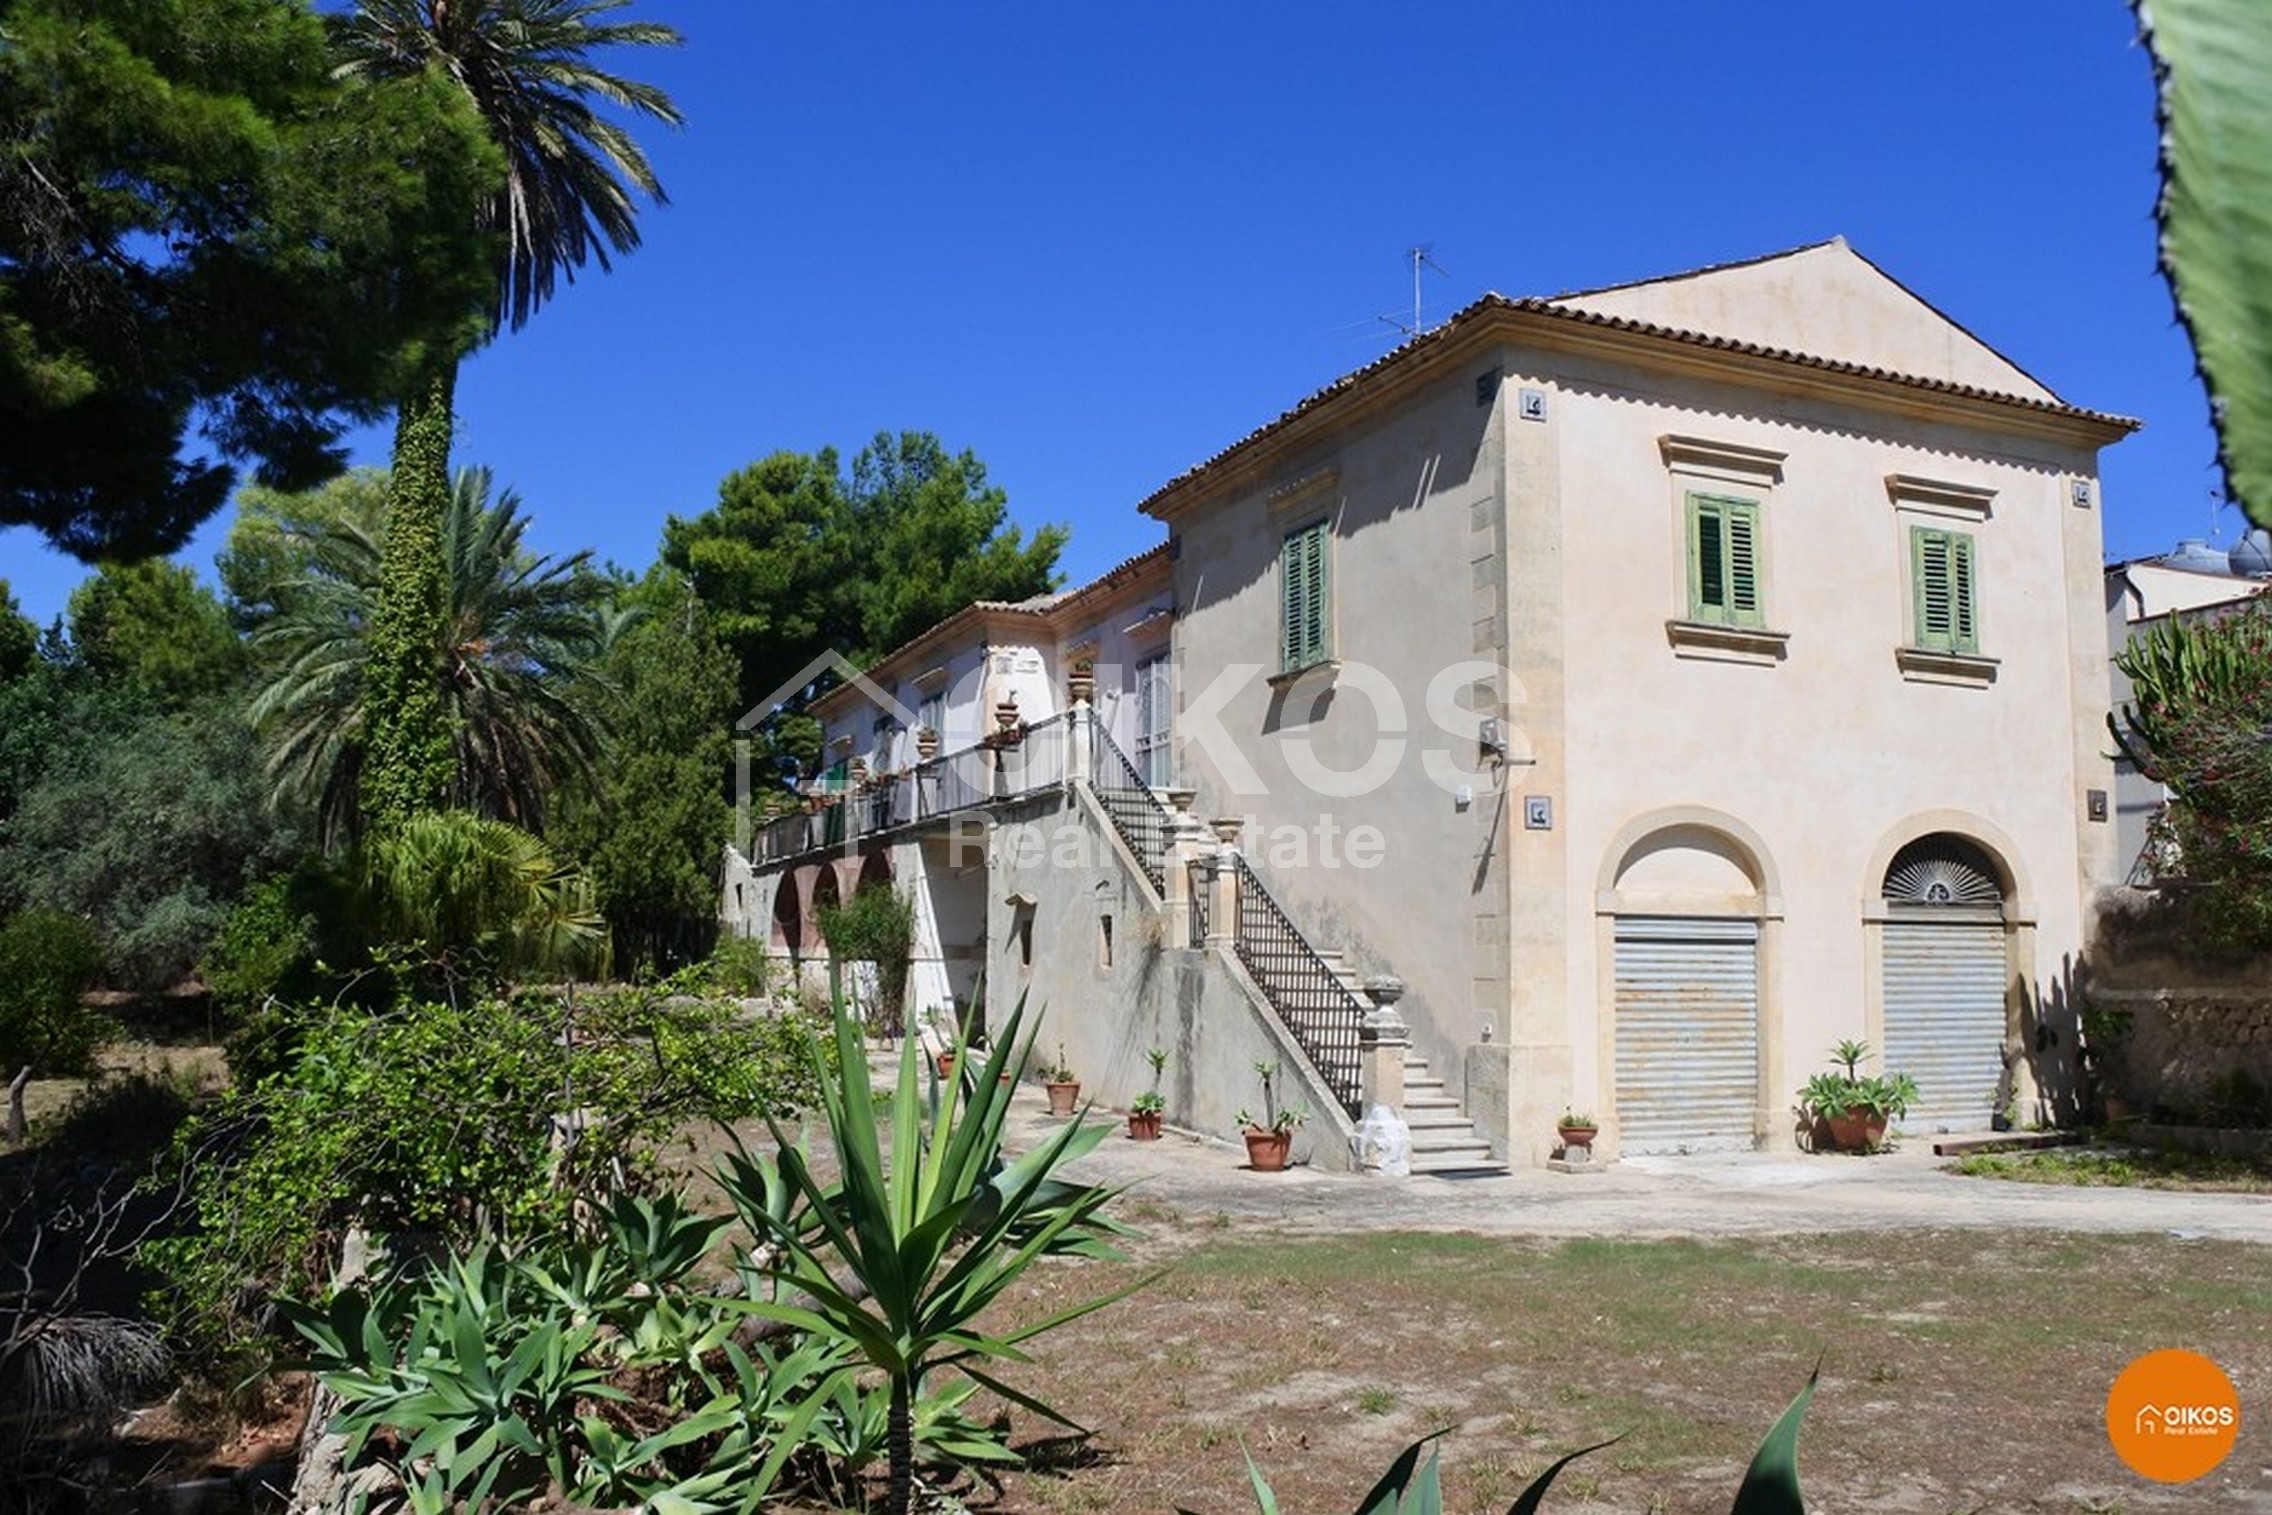 Villa ottocentesca con parco a Noto